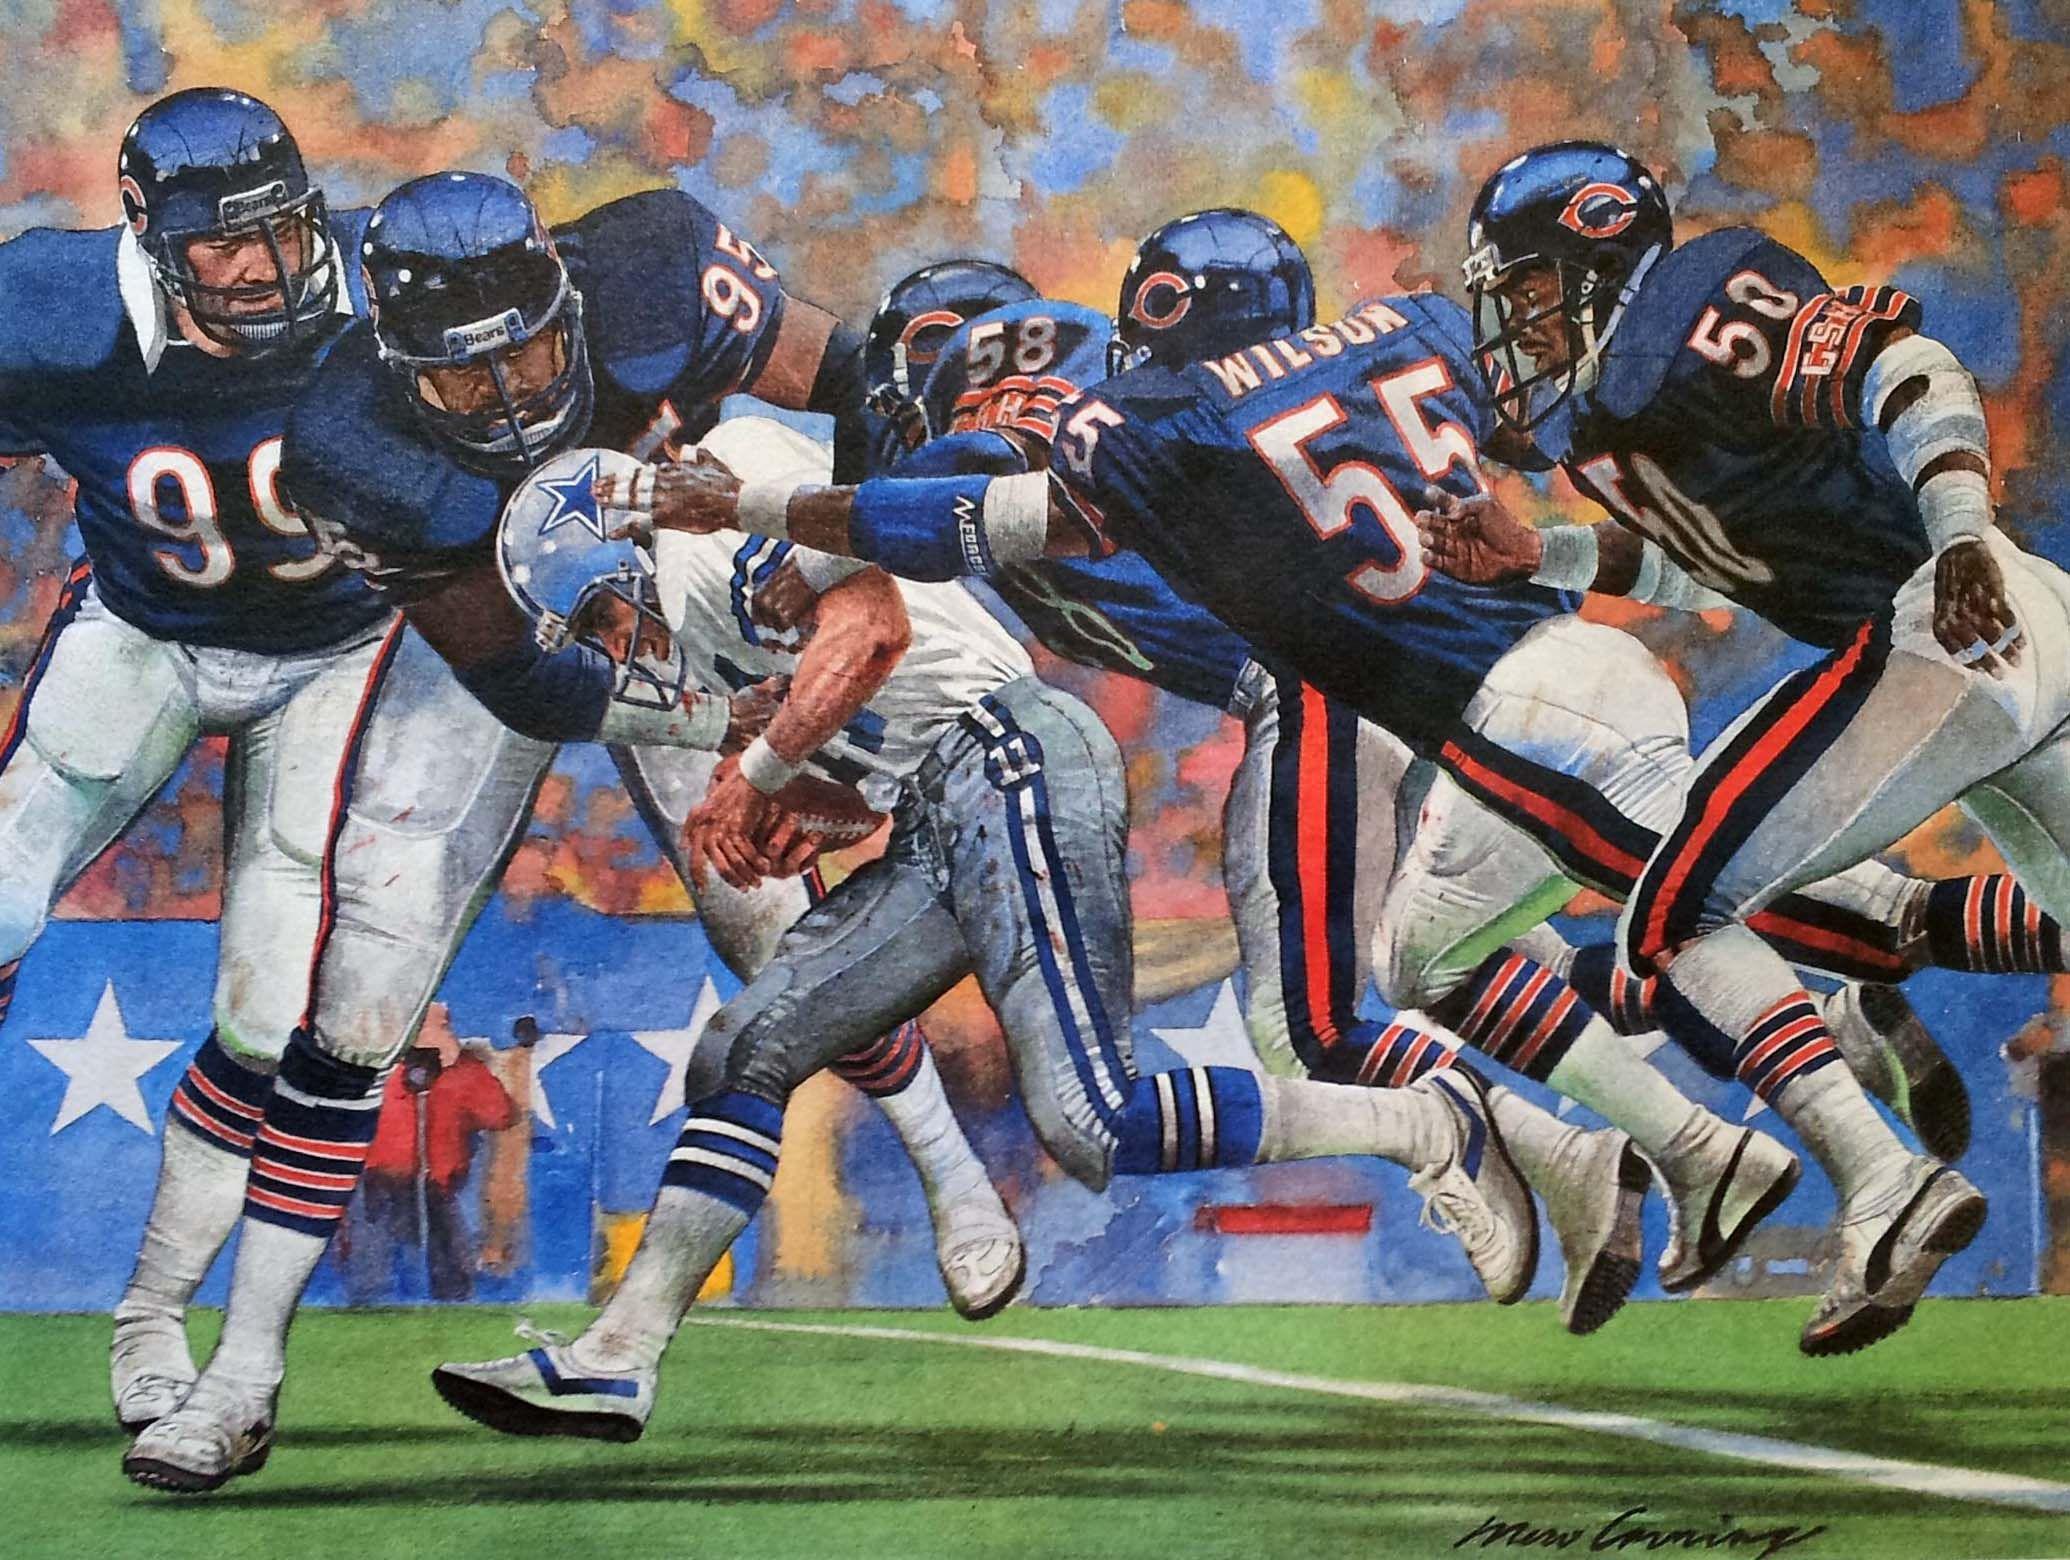 1985 Chicago Bears Vs. Dallas Cowboys, Sears Print By Merv